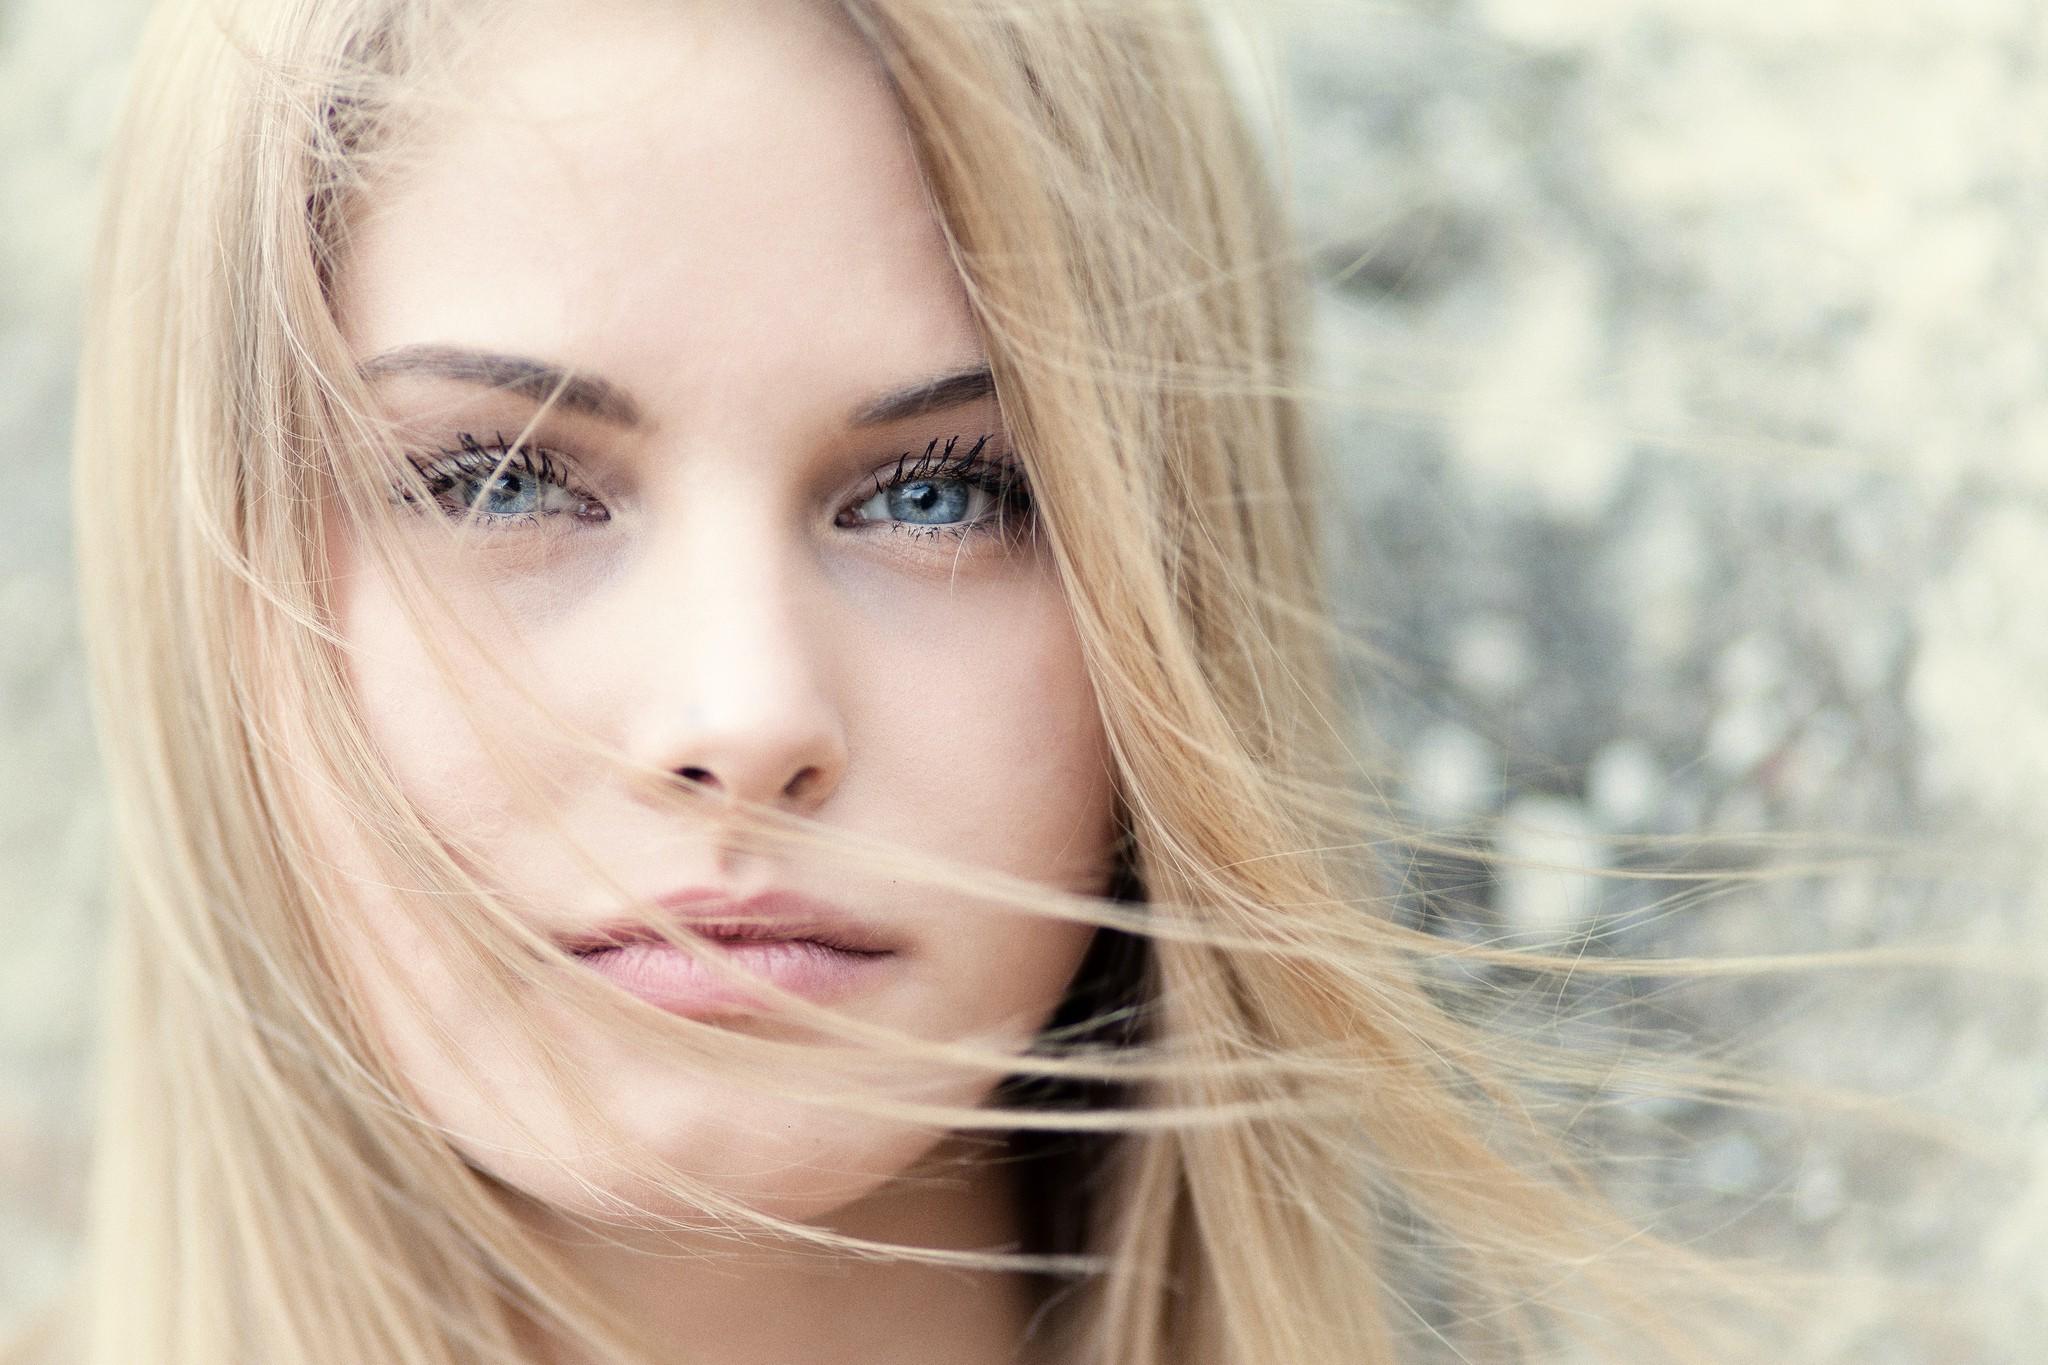 Wallpaper Face Model Blonde Long Hair Blue Eyes: Wallpaper : Face, Women, Model, Blonde, Eyes, Long Hair